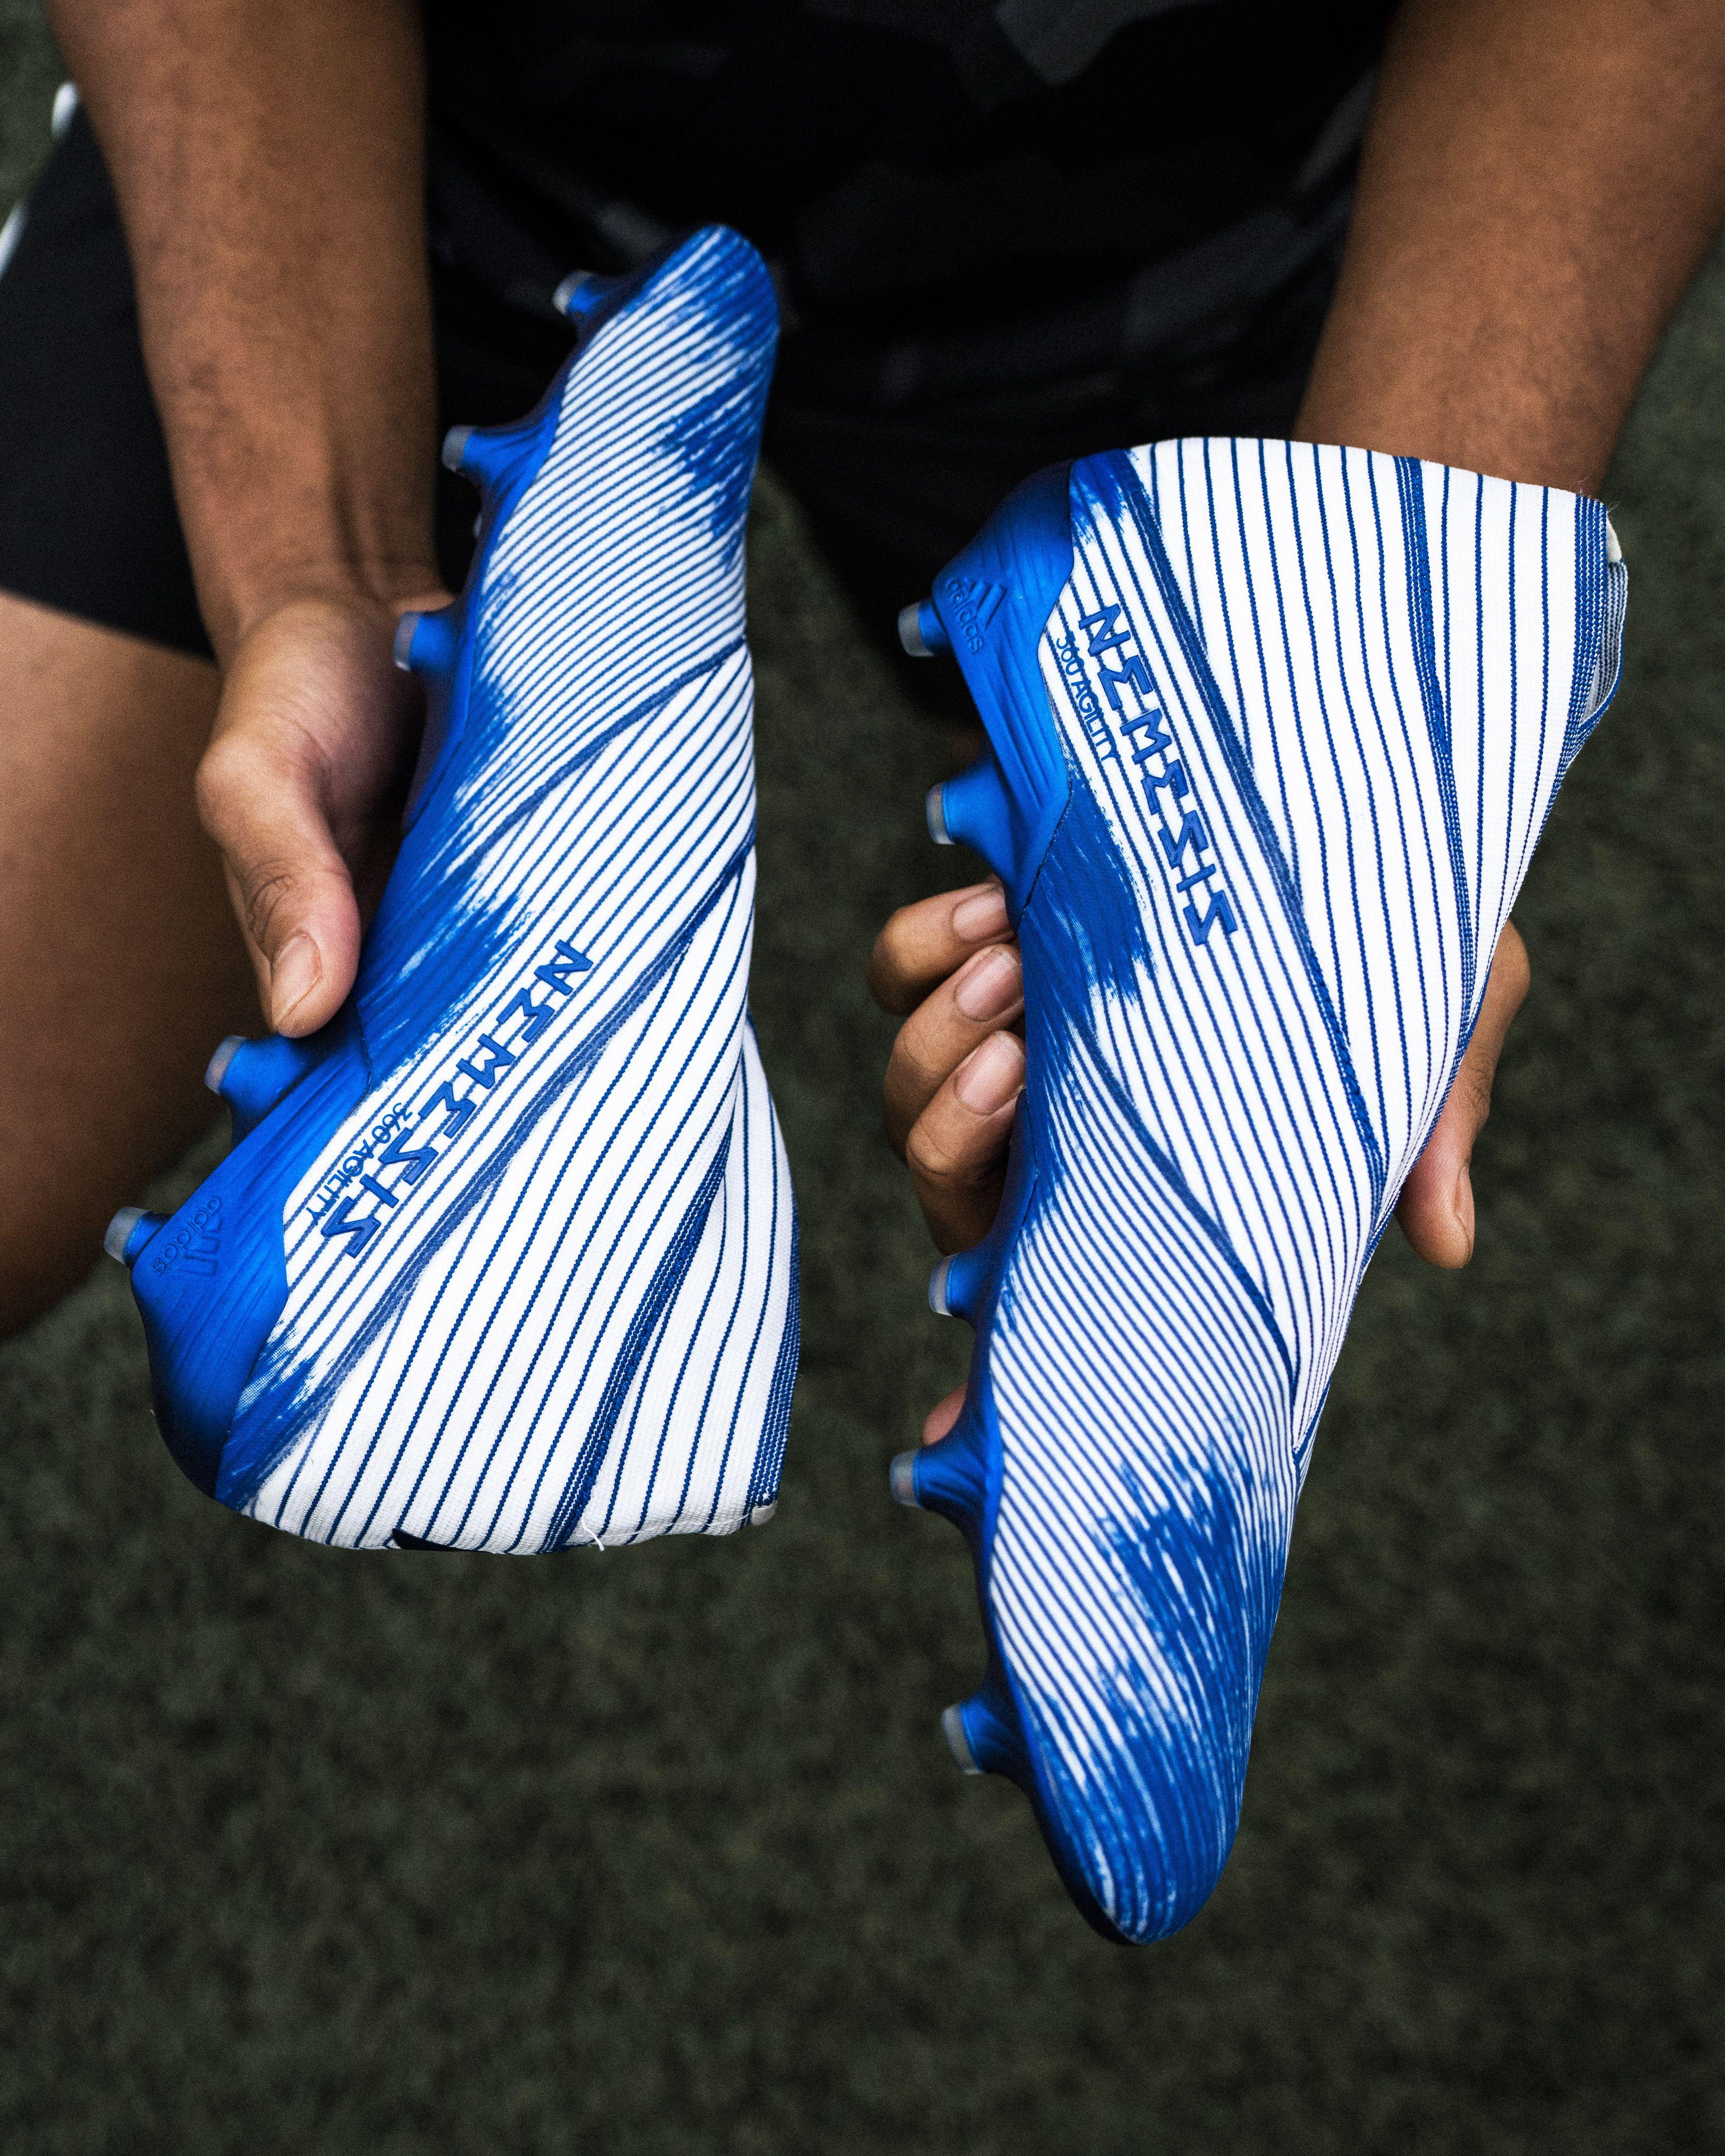 Adidas Nemeziz 19 Fg Soccer Cleats White Royal Blue In 2020 Soccer Cleats Soccer Cleats Adidas Soccer Boots